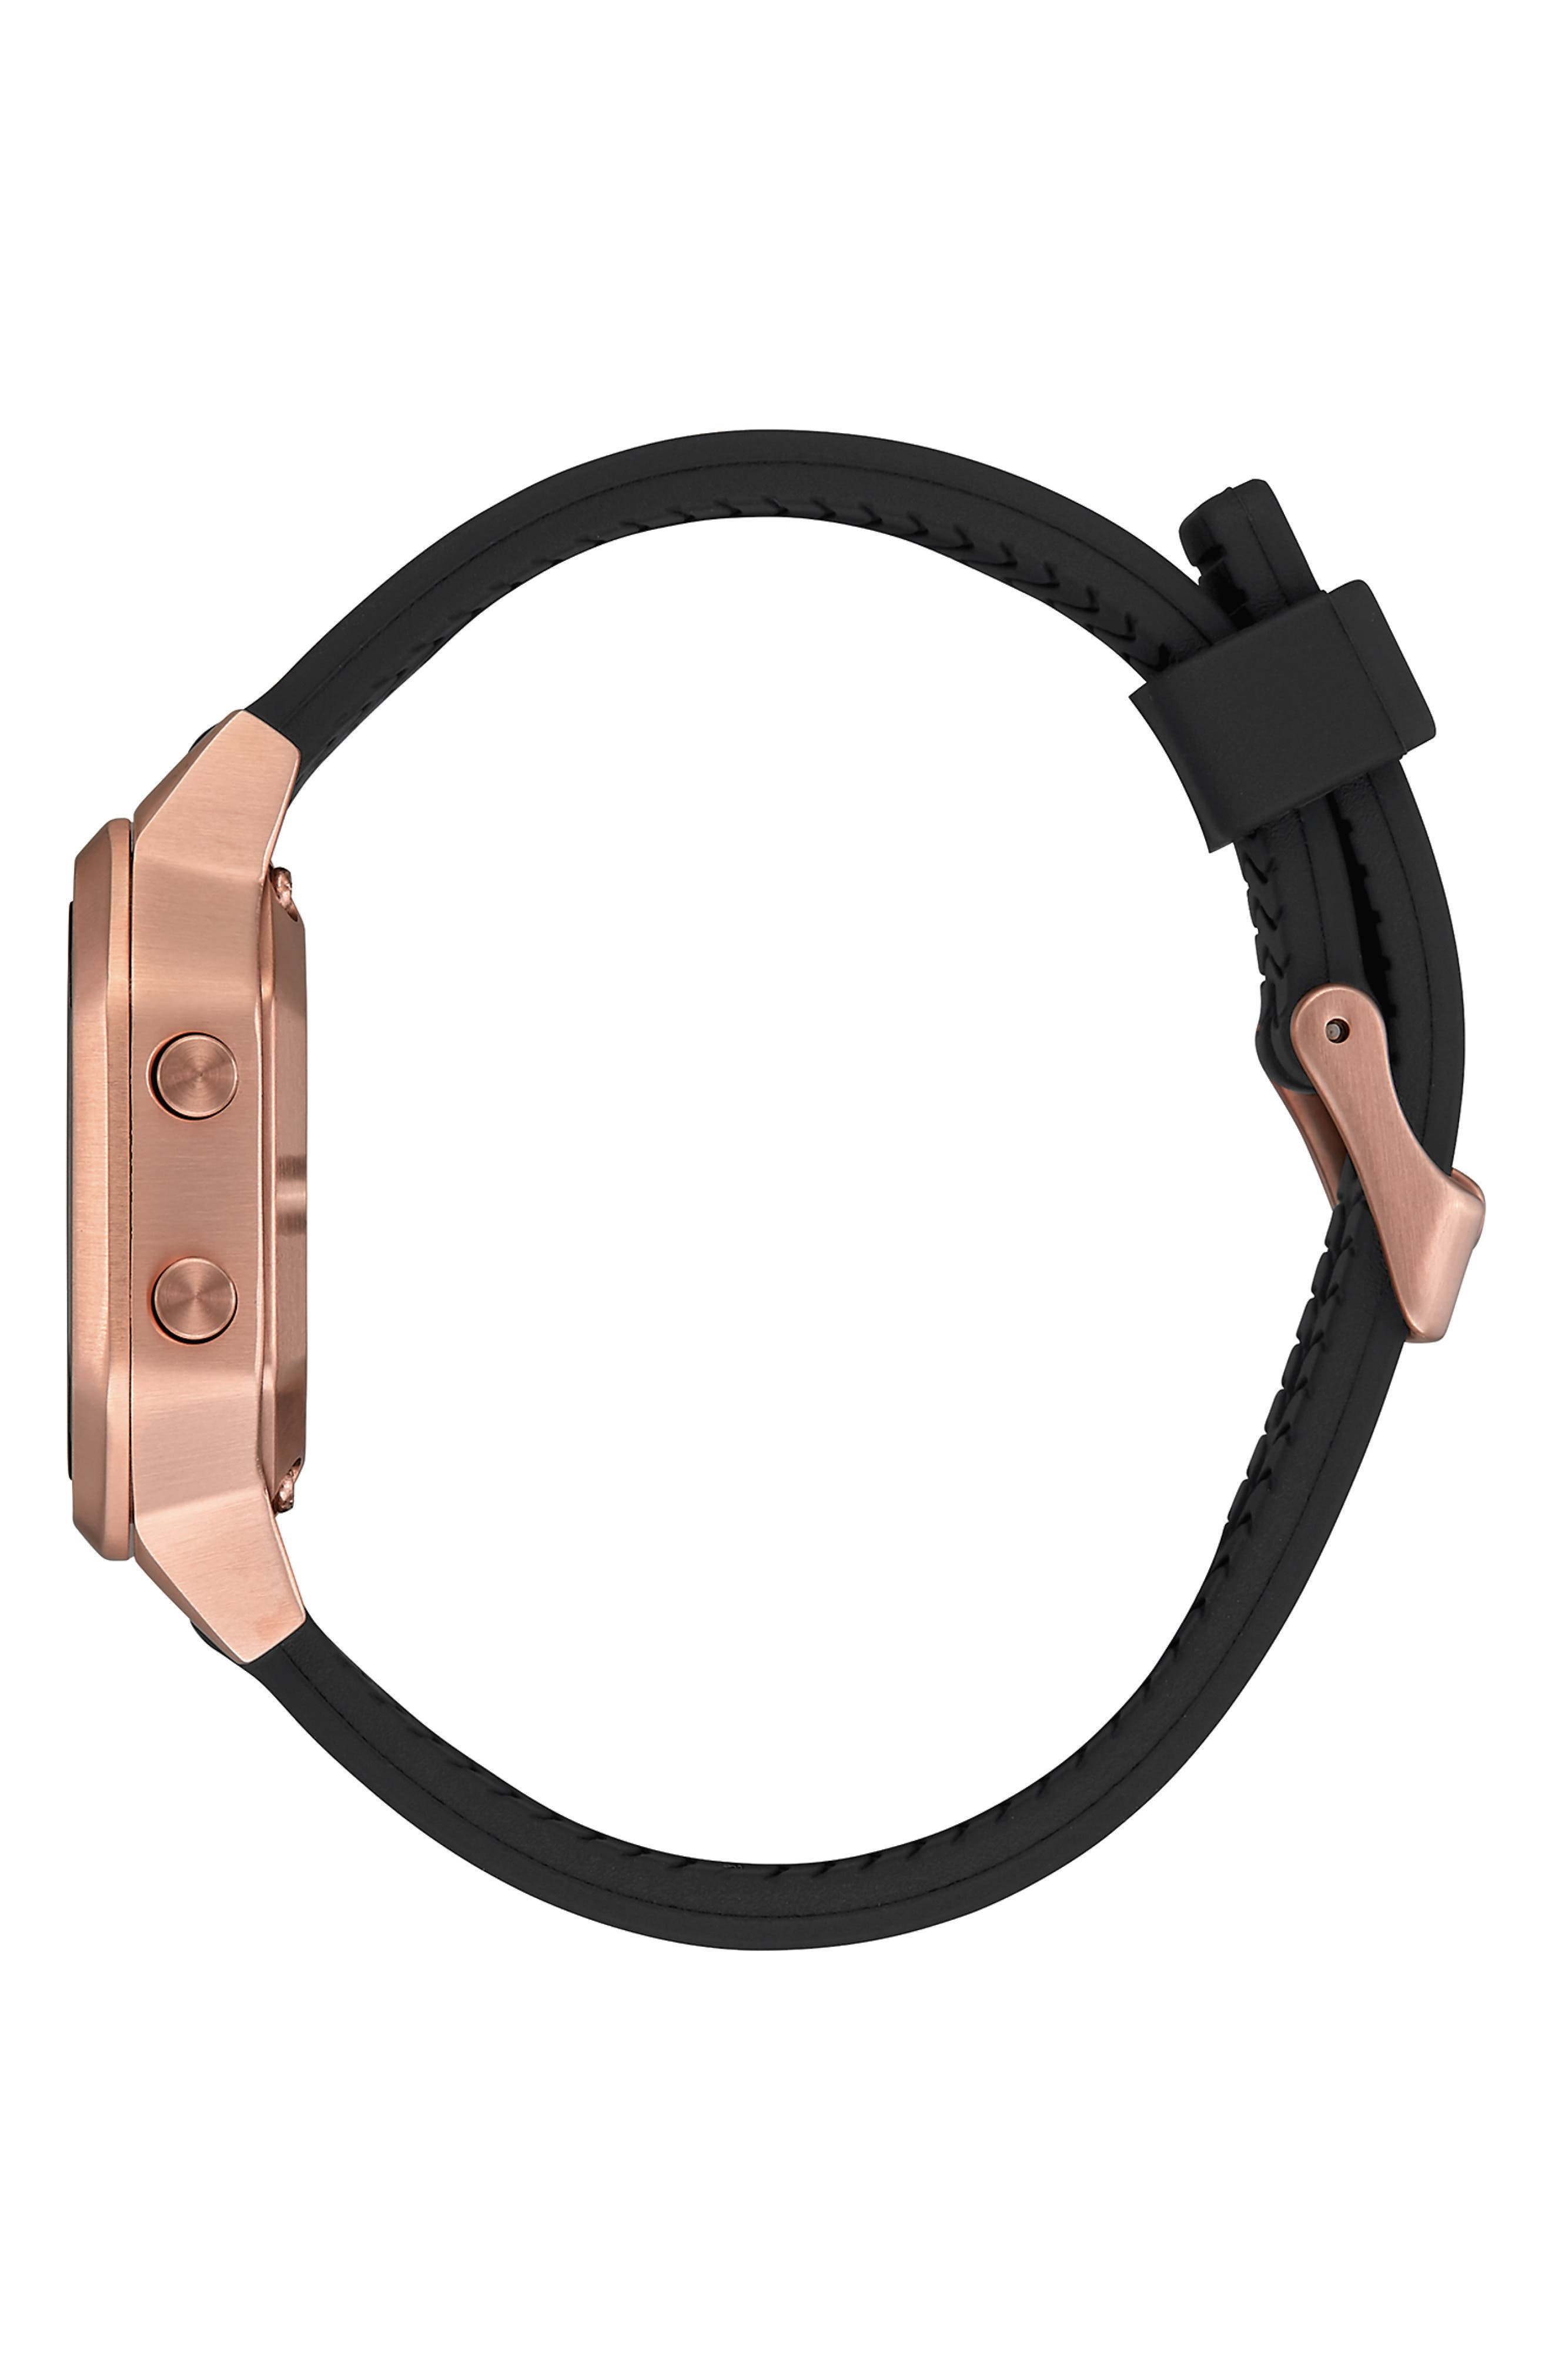 NIXON, Siren Digital Watch, 36mm, Alternate thumbnail 3, color, BLACK/ ROSE GOLD